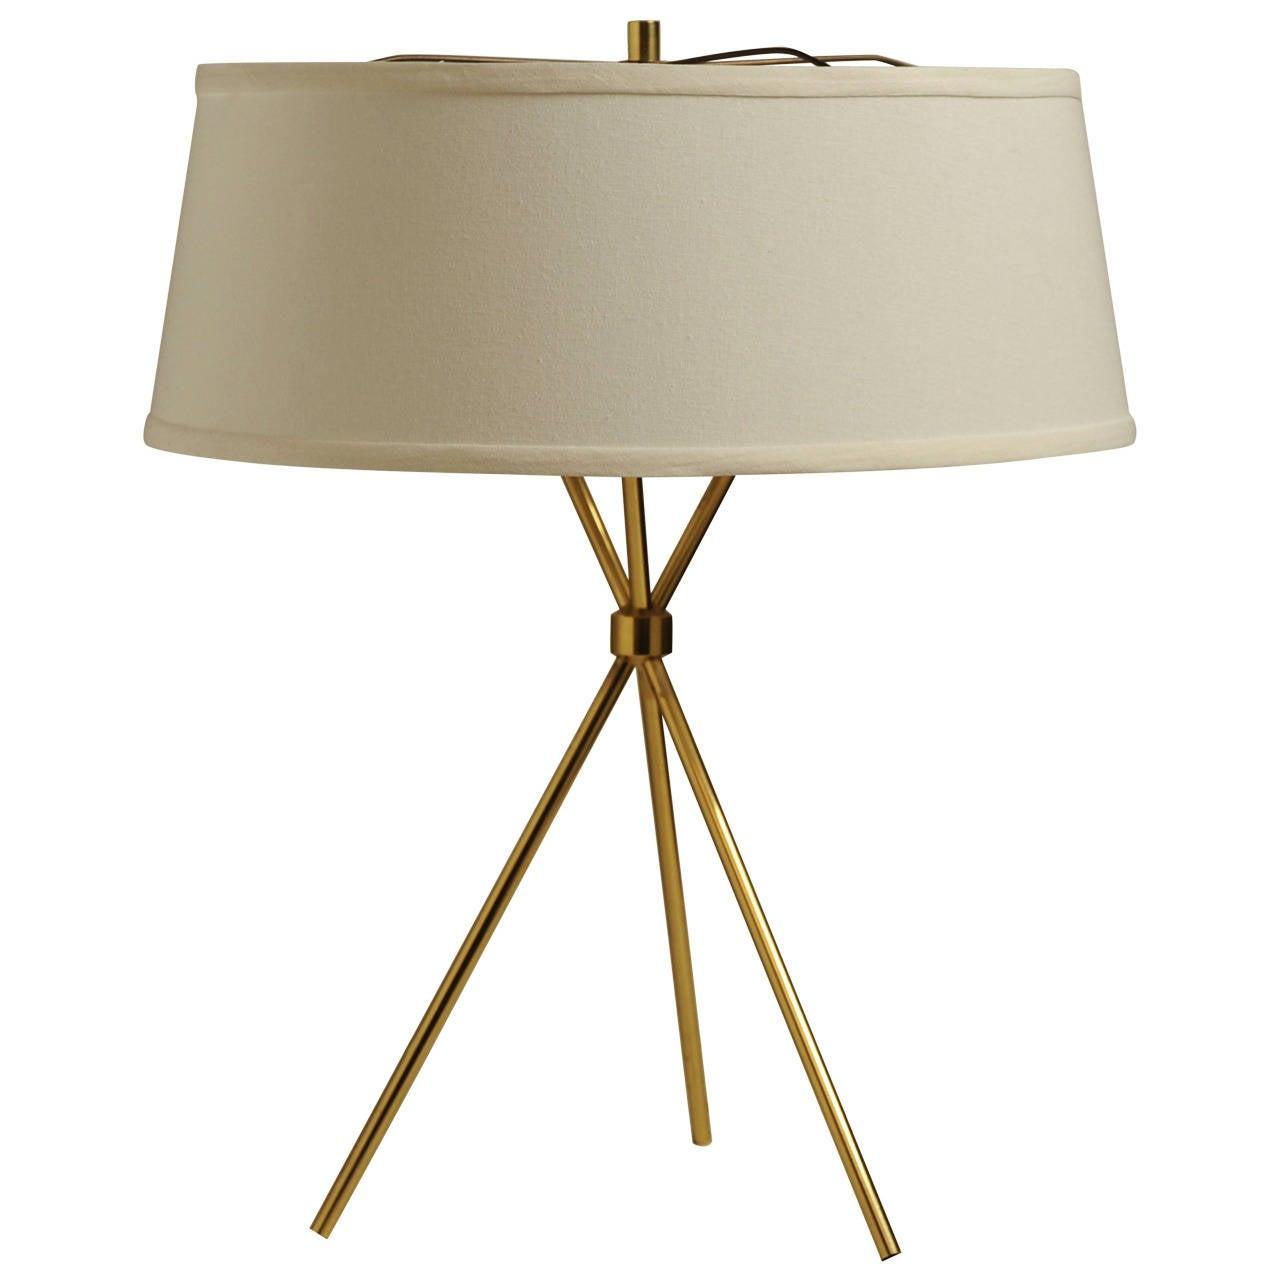 hansen brass tripod table lamp at 1stdibs. Black Bedroom Furniture Sets. Home Design Ideas